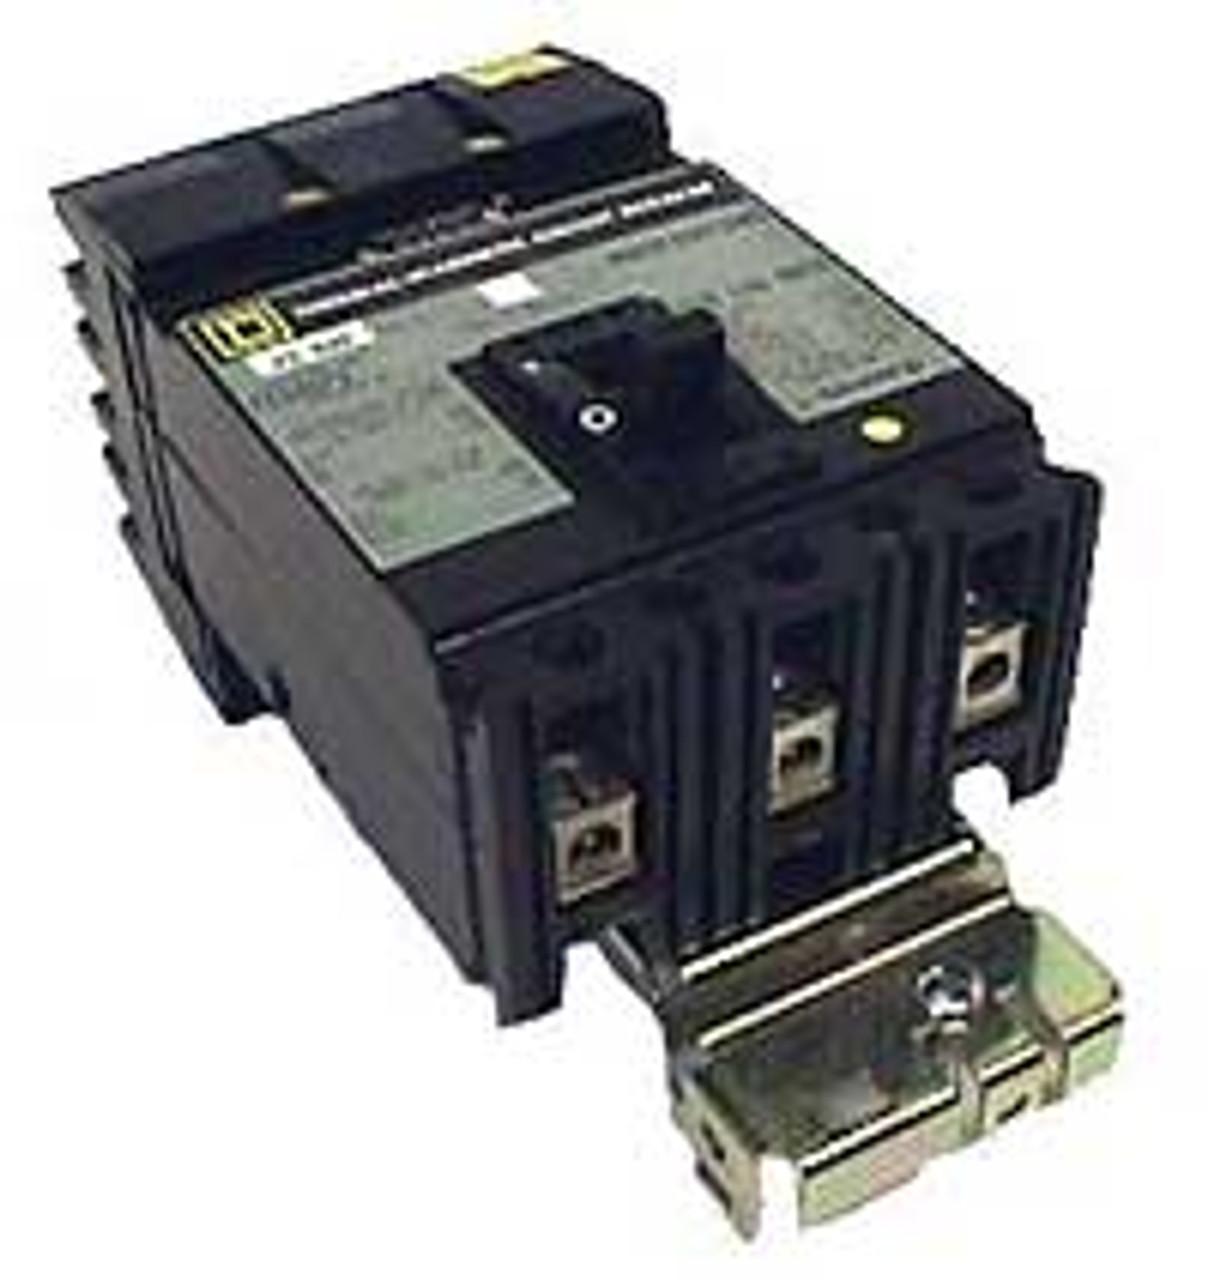 Square D FGA34080 3 Pole 80 Amp 480 VAC Circuit Breaker - Used